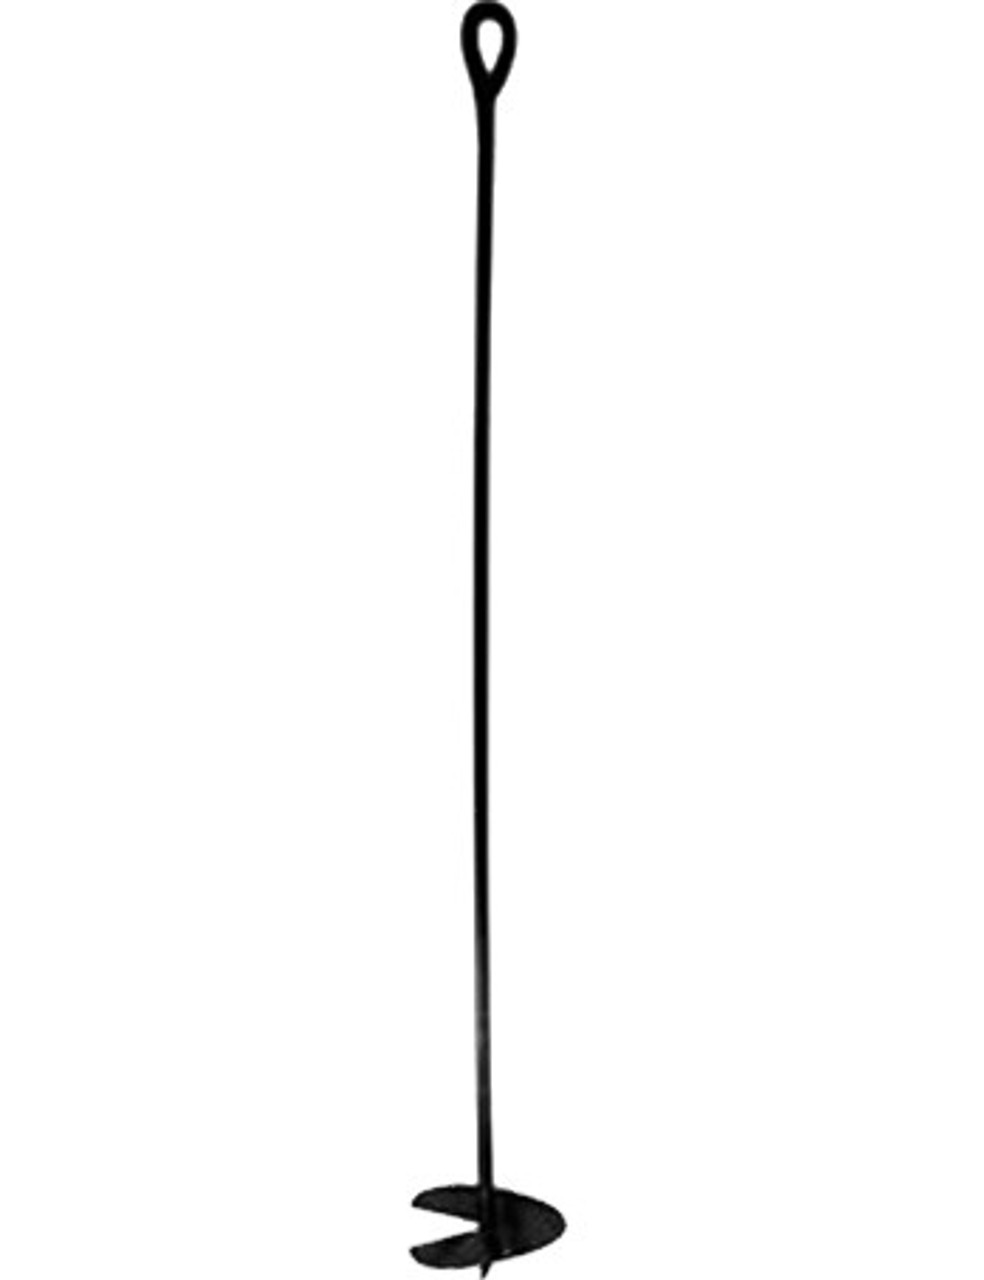 "HEAVY DUTY Screw in Anchor 3/4"" x 48"" w/6"" Helix"